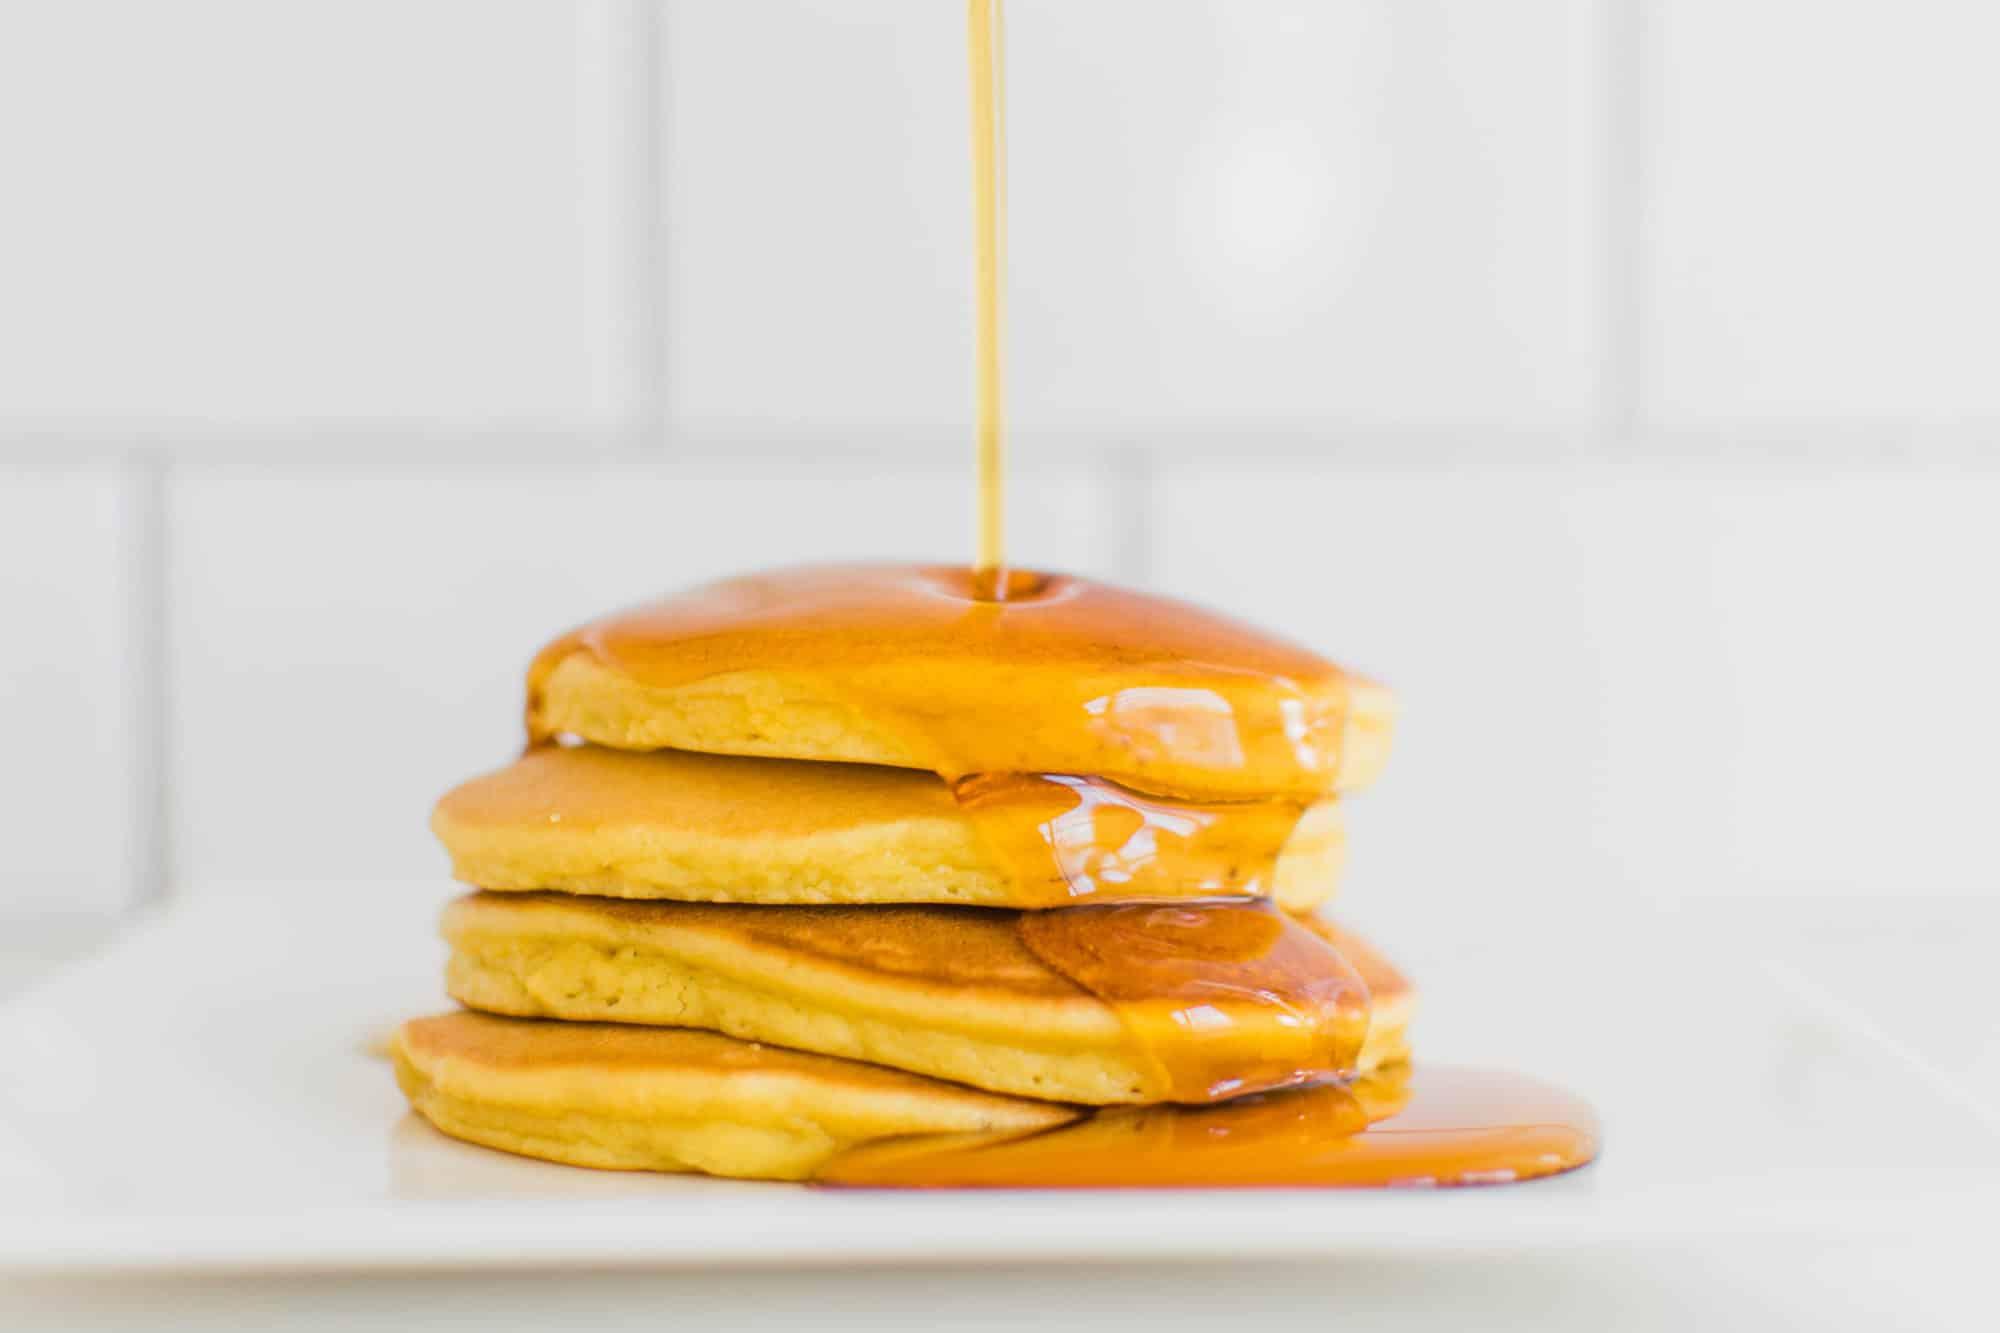 Frenchie Farm paleo pancake recipe: gluten free + grain free pancakes